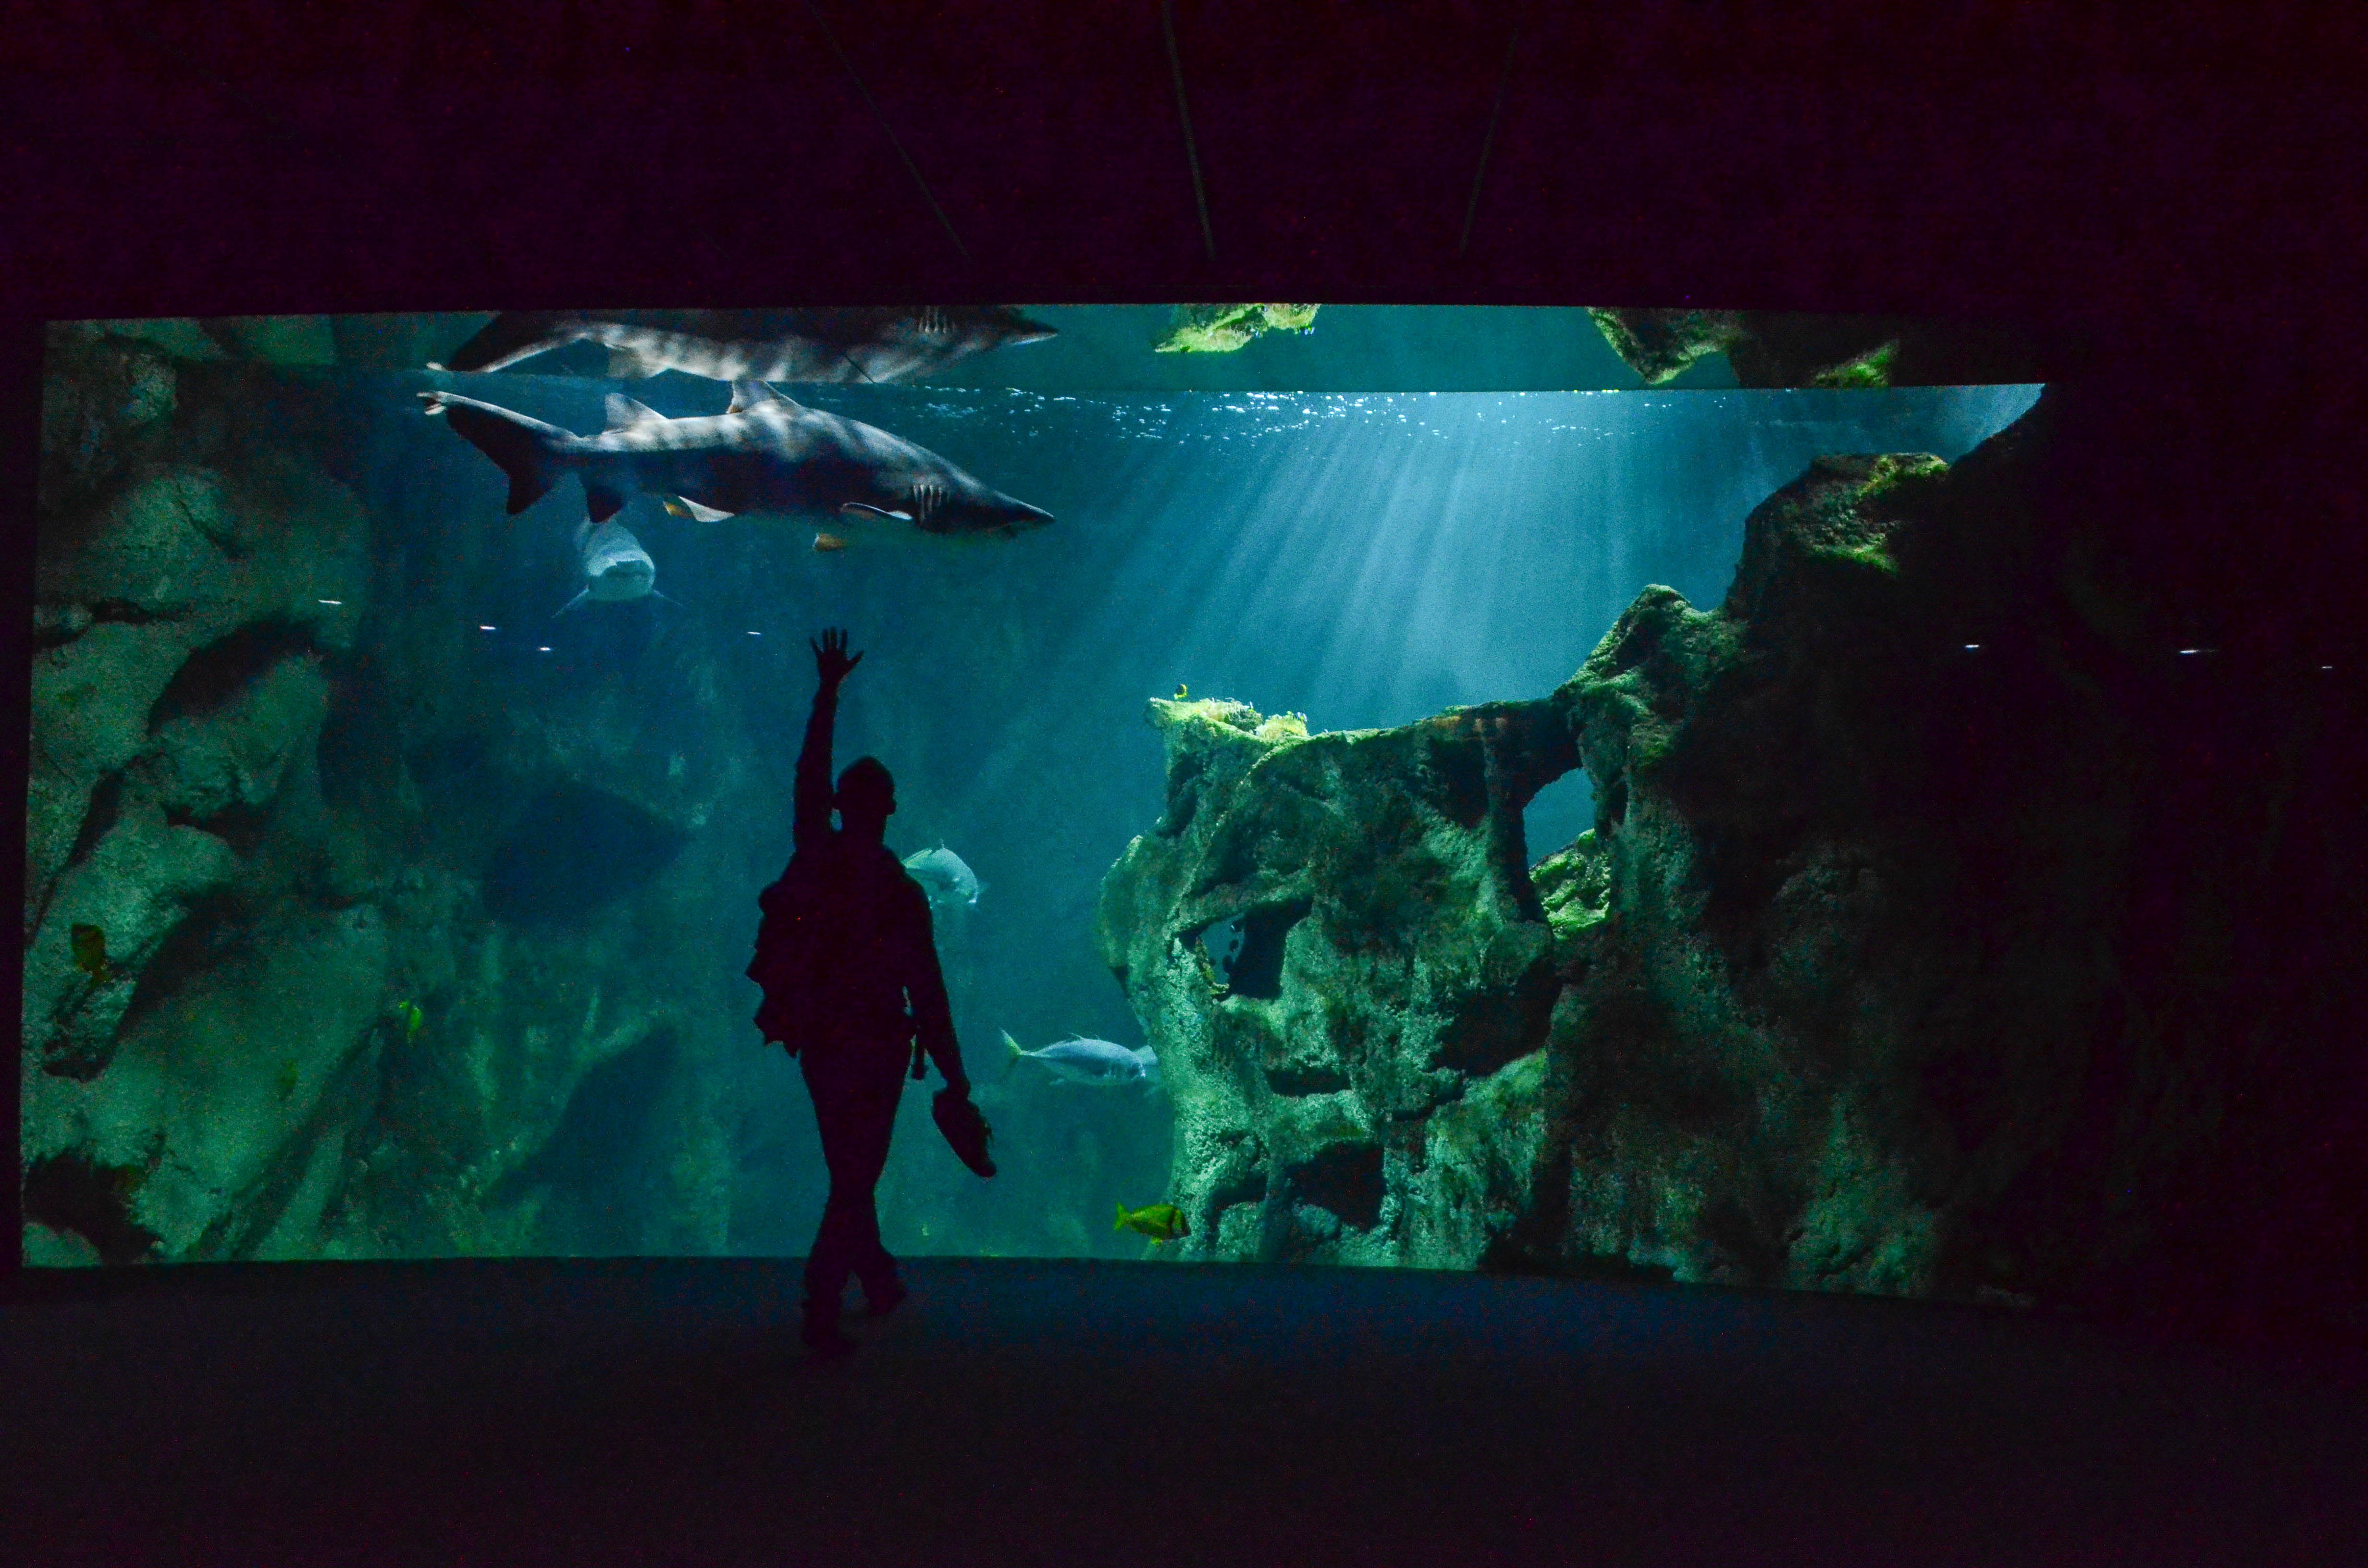 Aquarium requins la rochelle